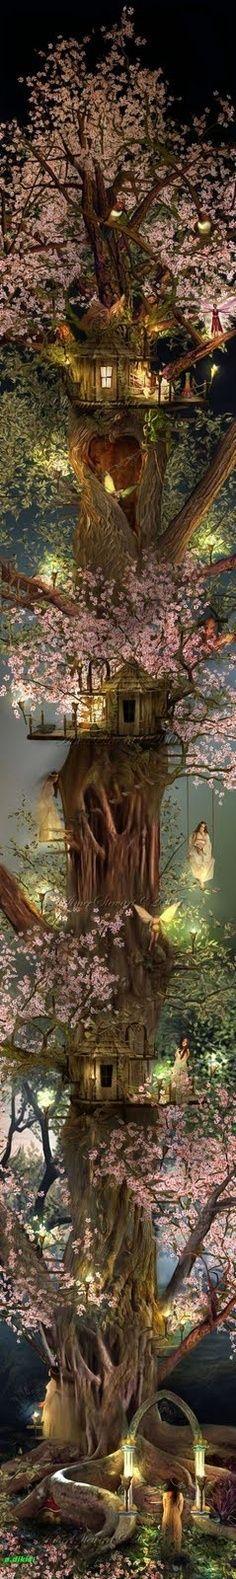 Fairy tree~